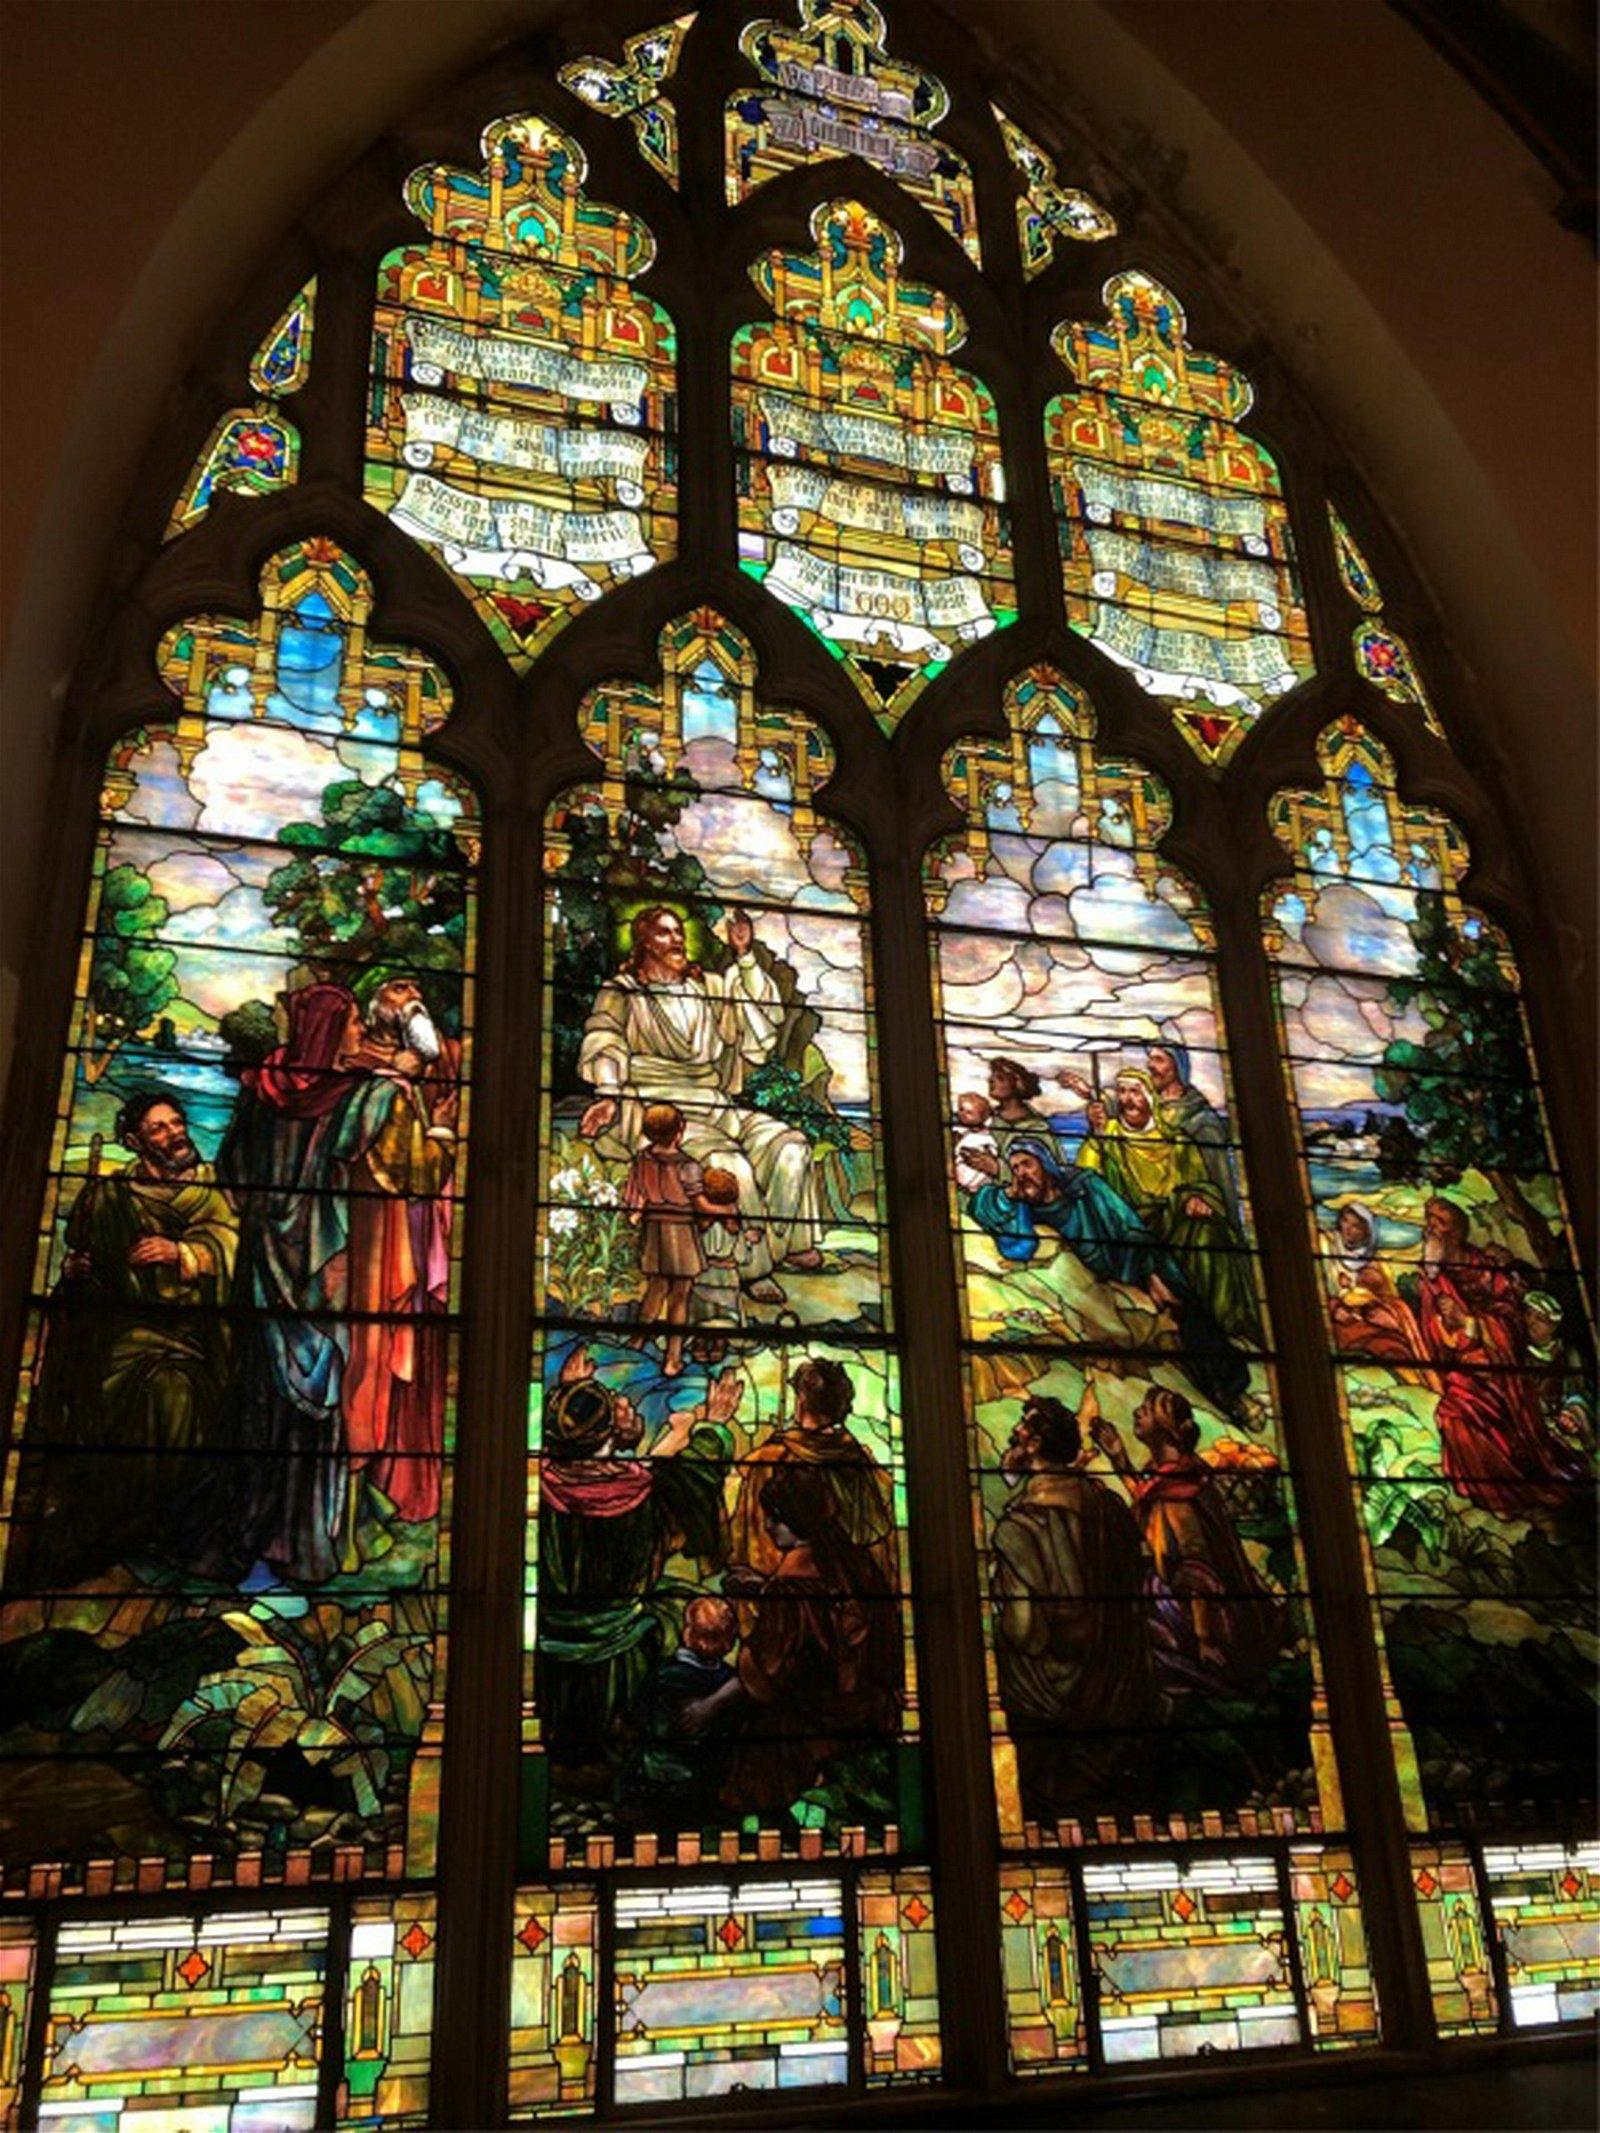 Attr. Joseph Lauber Monumental Stained Glass Window